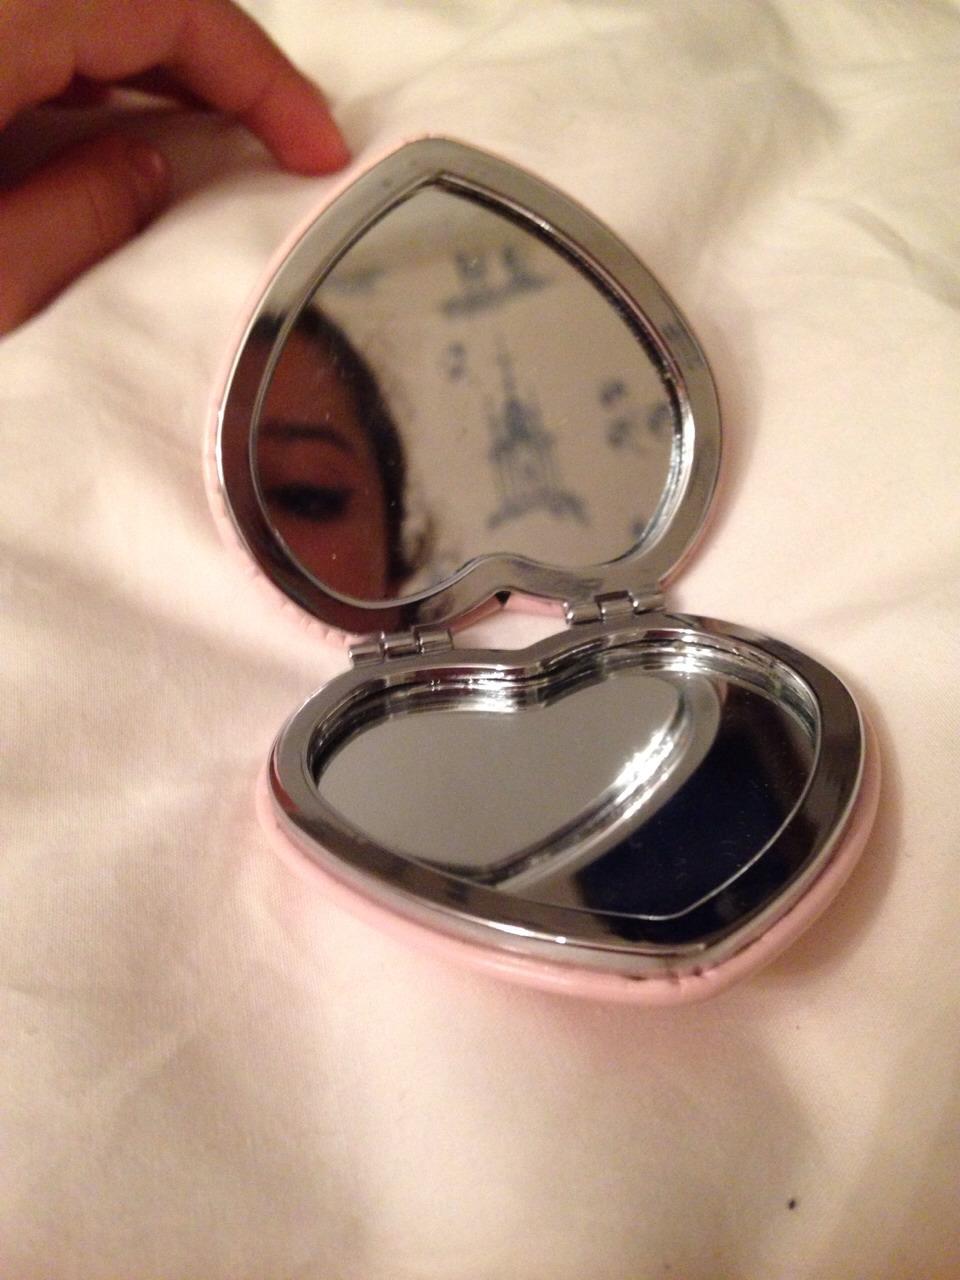 1⃣1⃣- MIRROR To see if you look like more like Marylyn Monroe or Dracula when applying makeup.